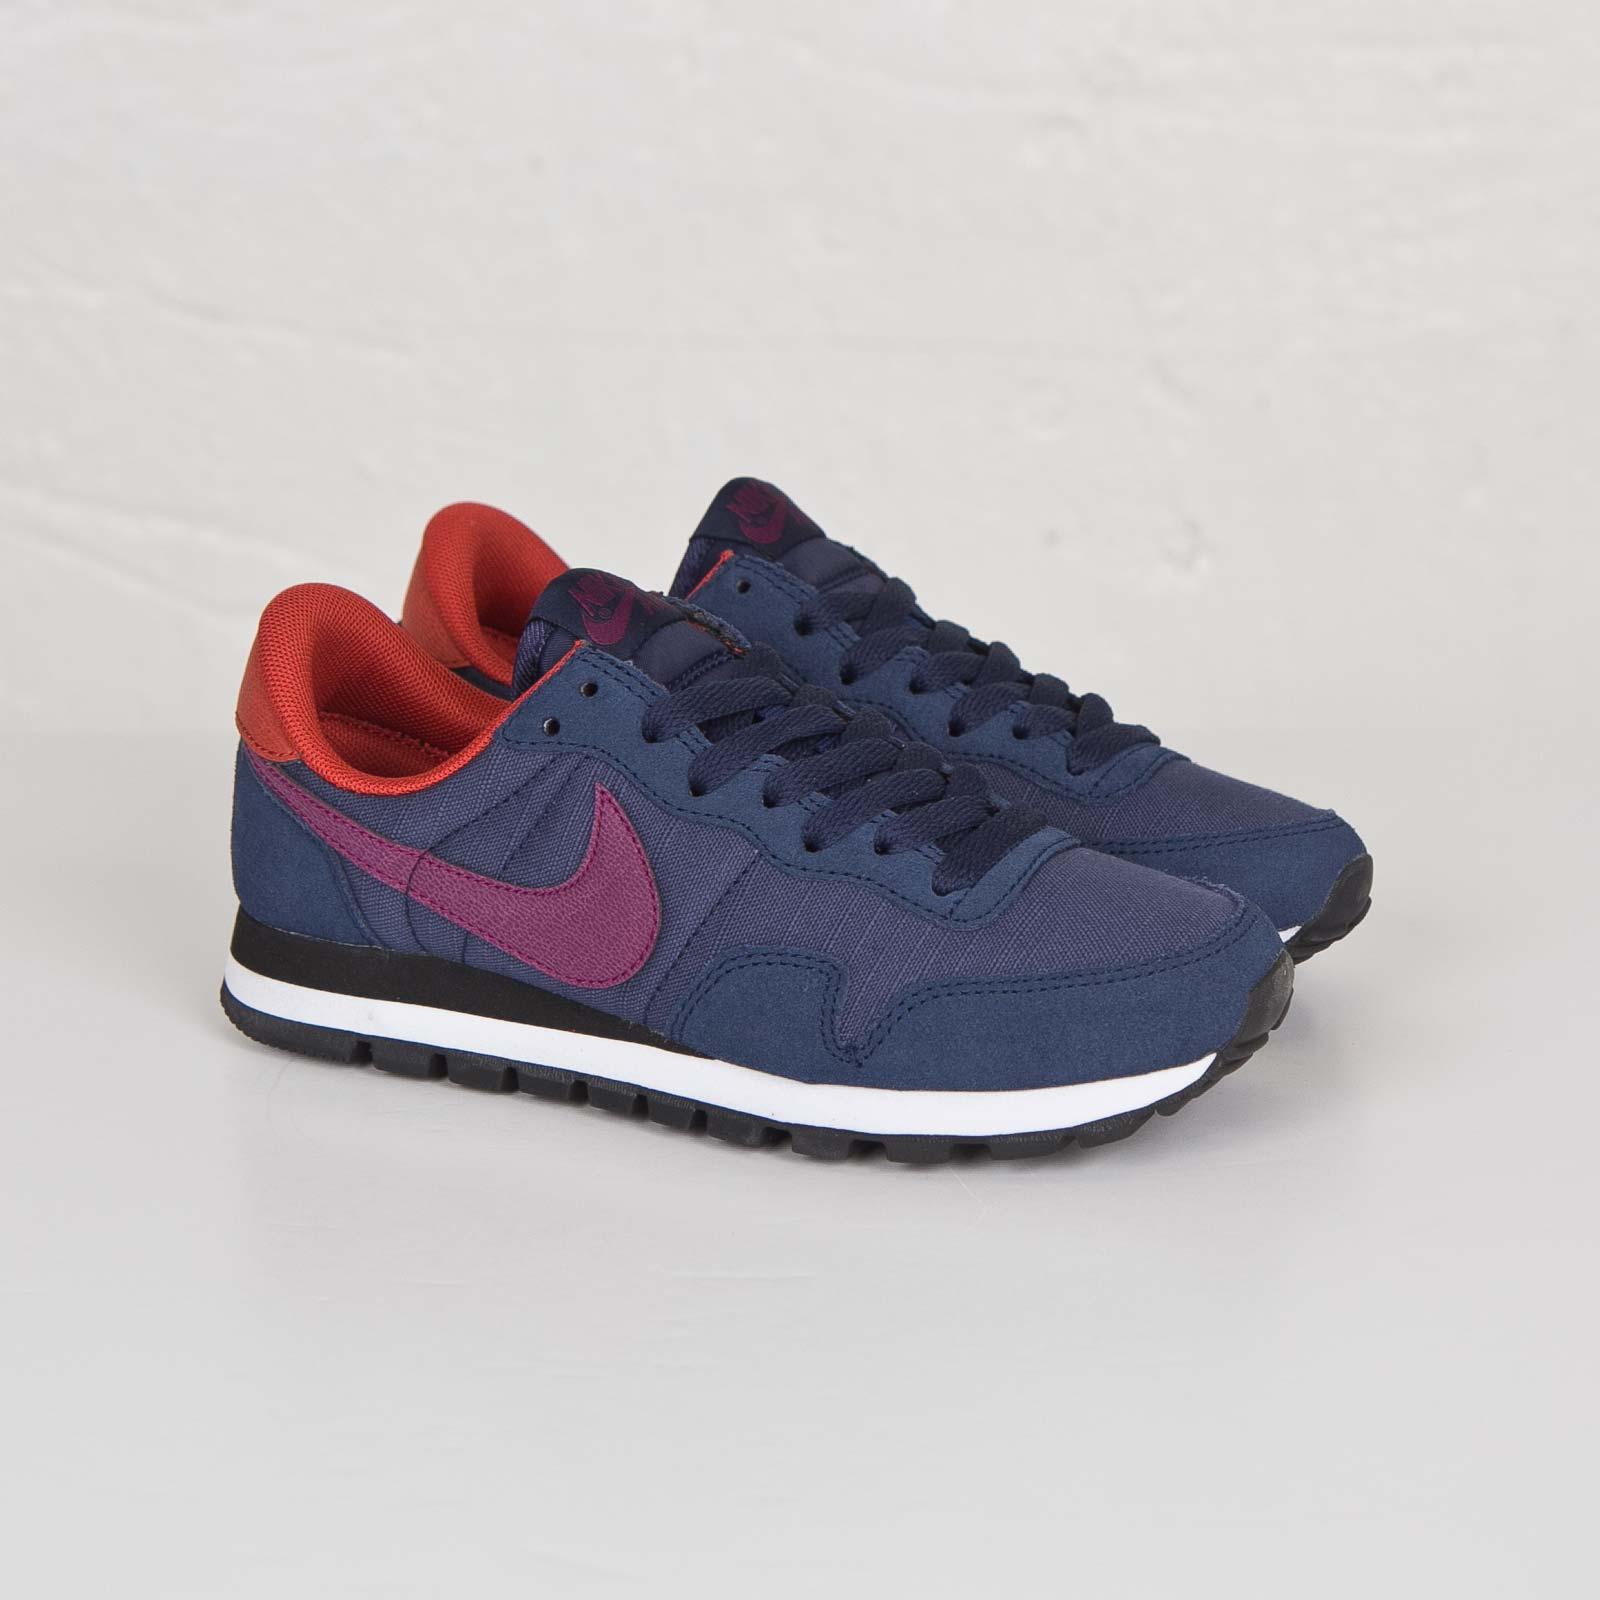 Nike Wmns Air Pegasus 83 407477 402 Sneakersnstuff I